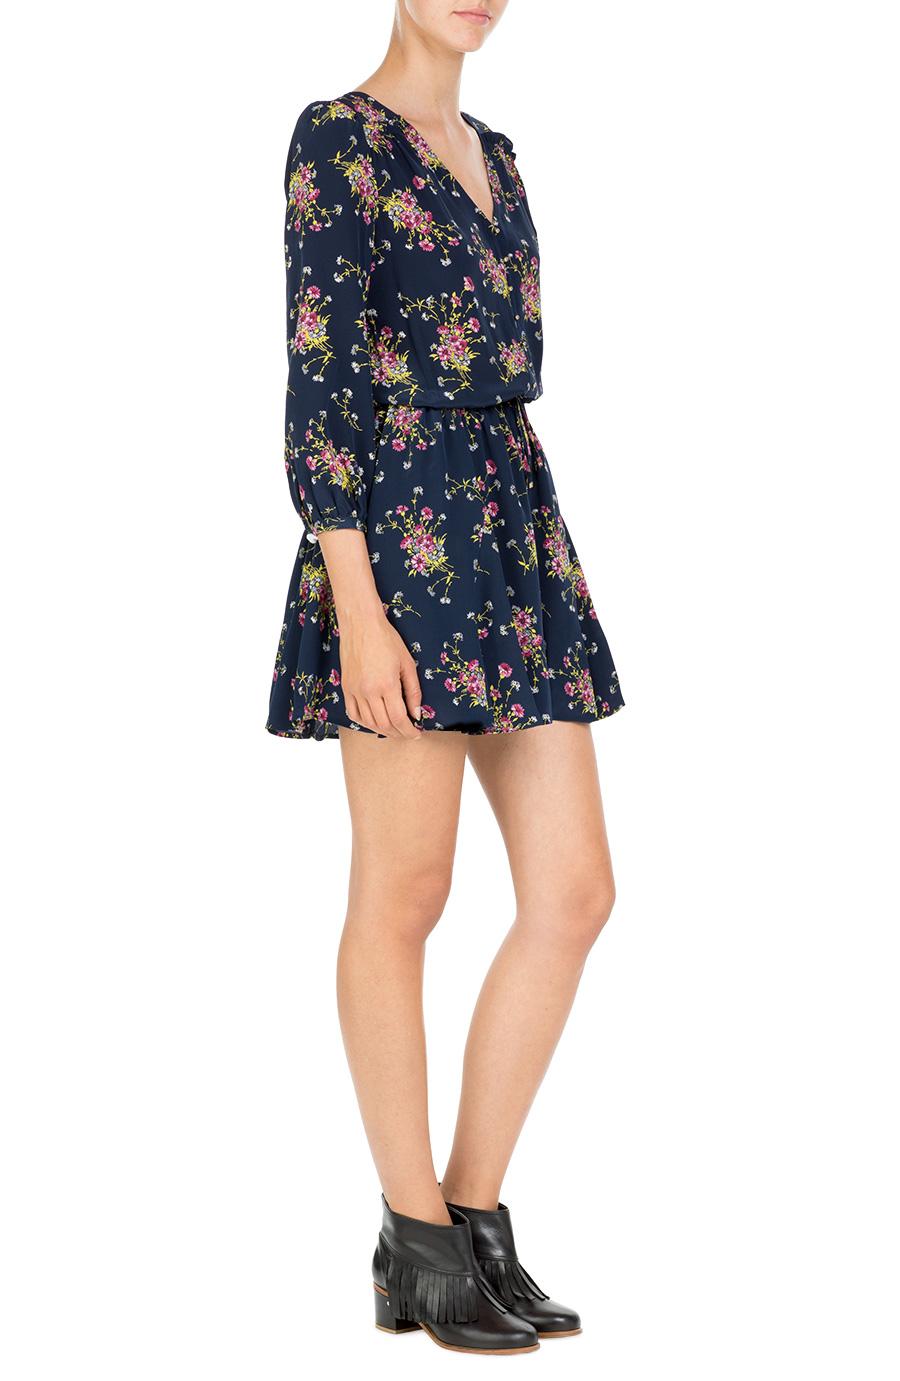 Juicy Couture - Silk Floral Dress 11d9c1cd3